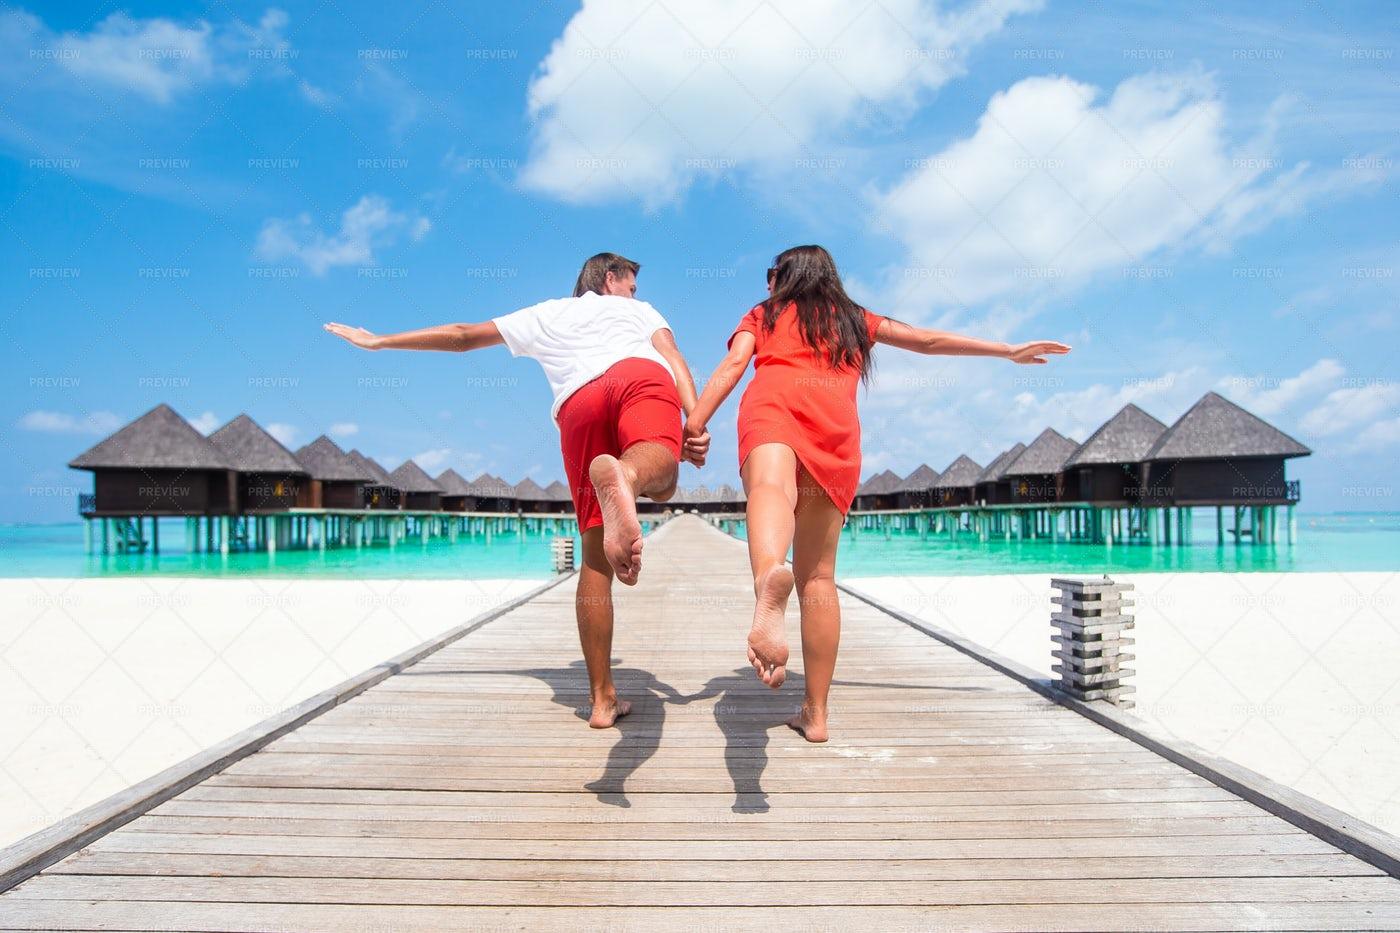 Couple Fooling Around On The Beach: Stock Photos